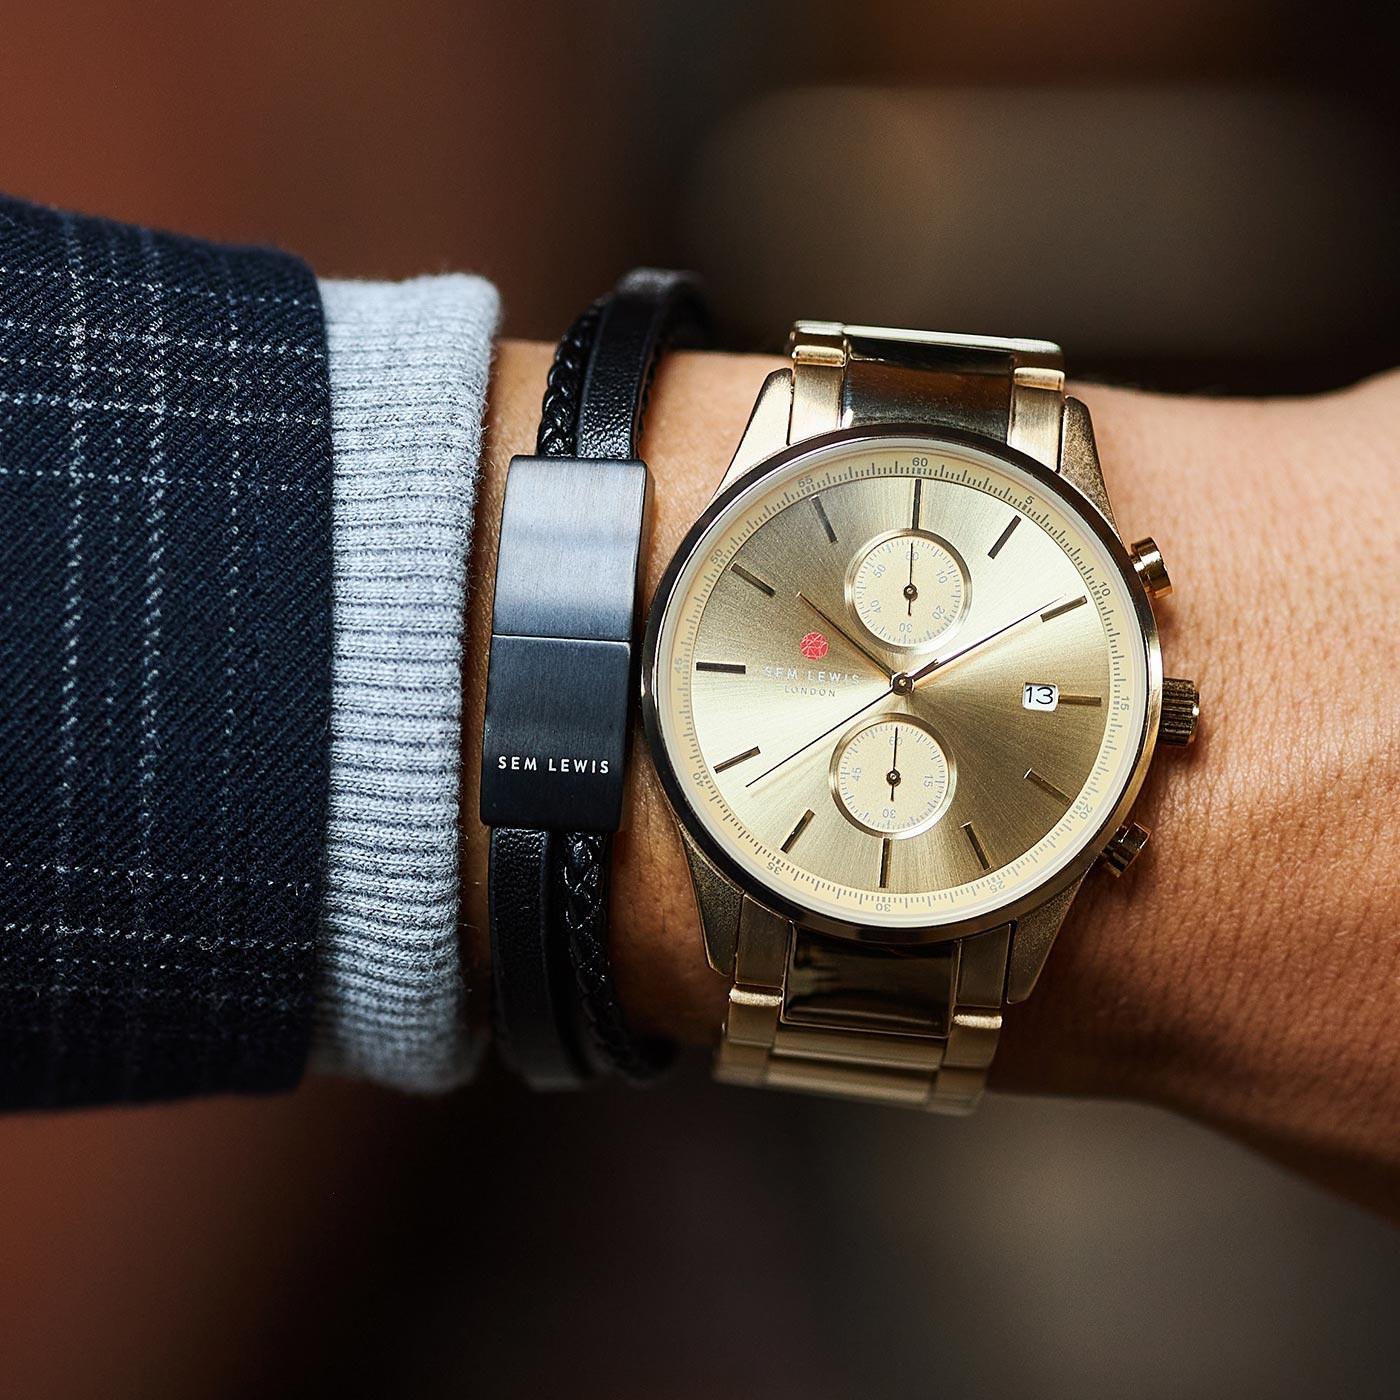 Sem Lewis Bakerloo Charing Cross Armband SL210026 (Lengte: 21.00 cm)